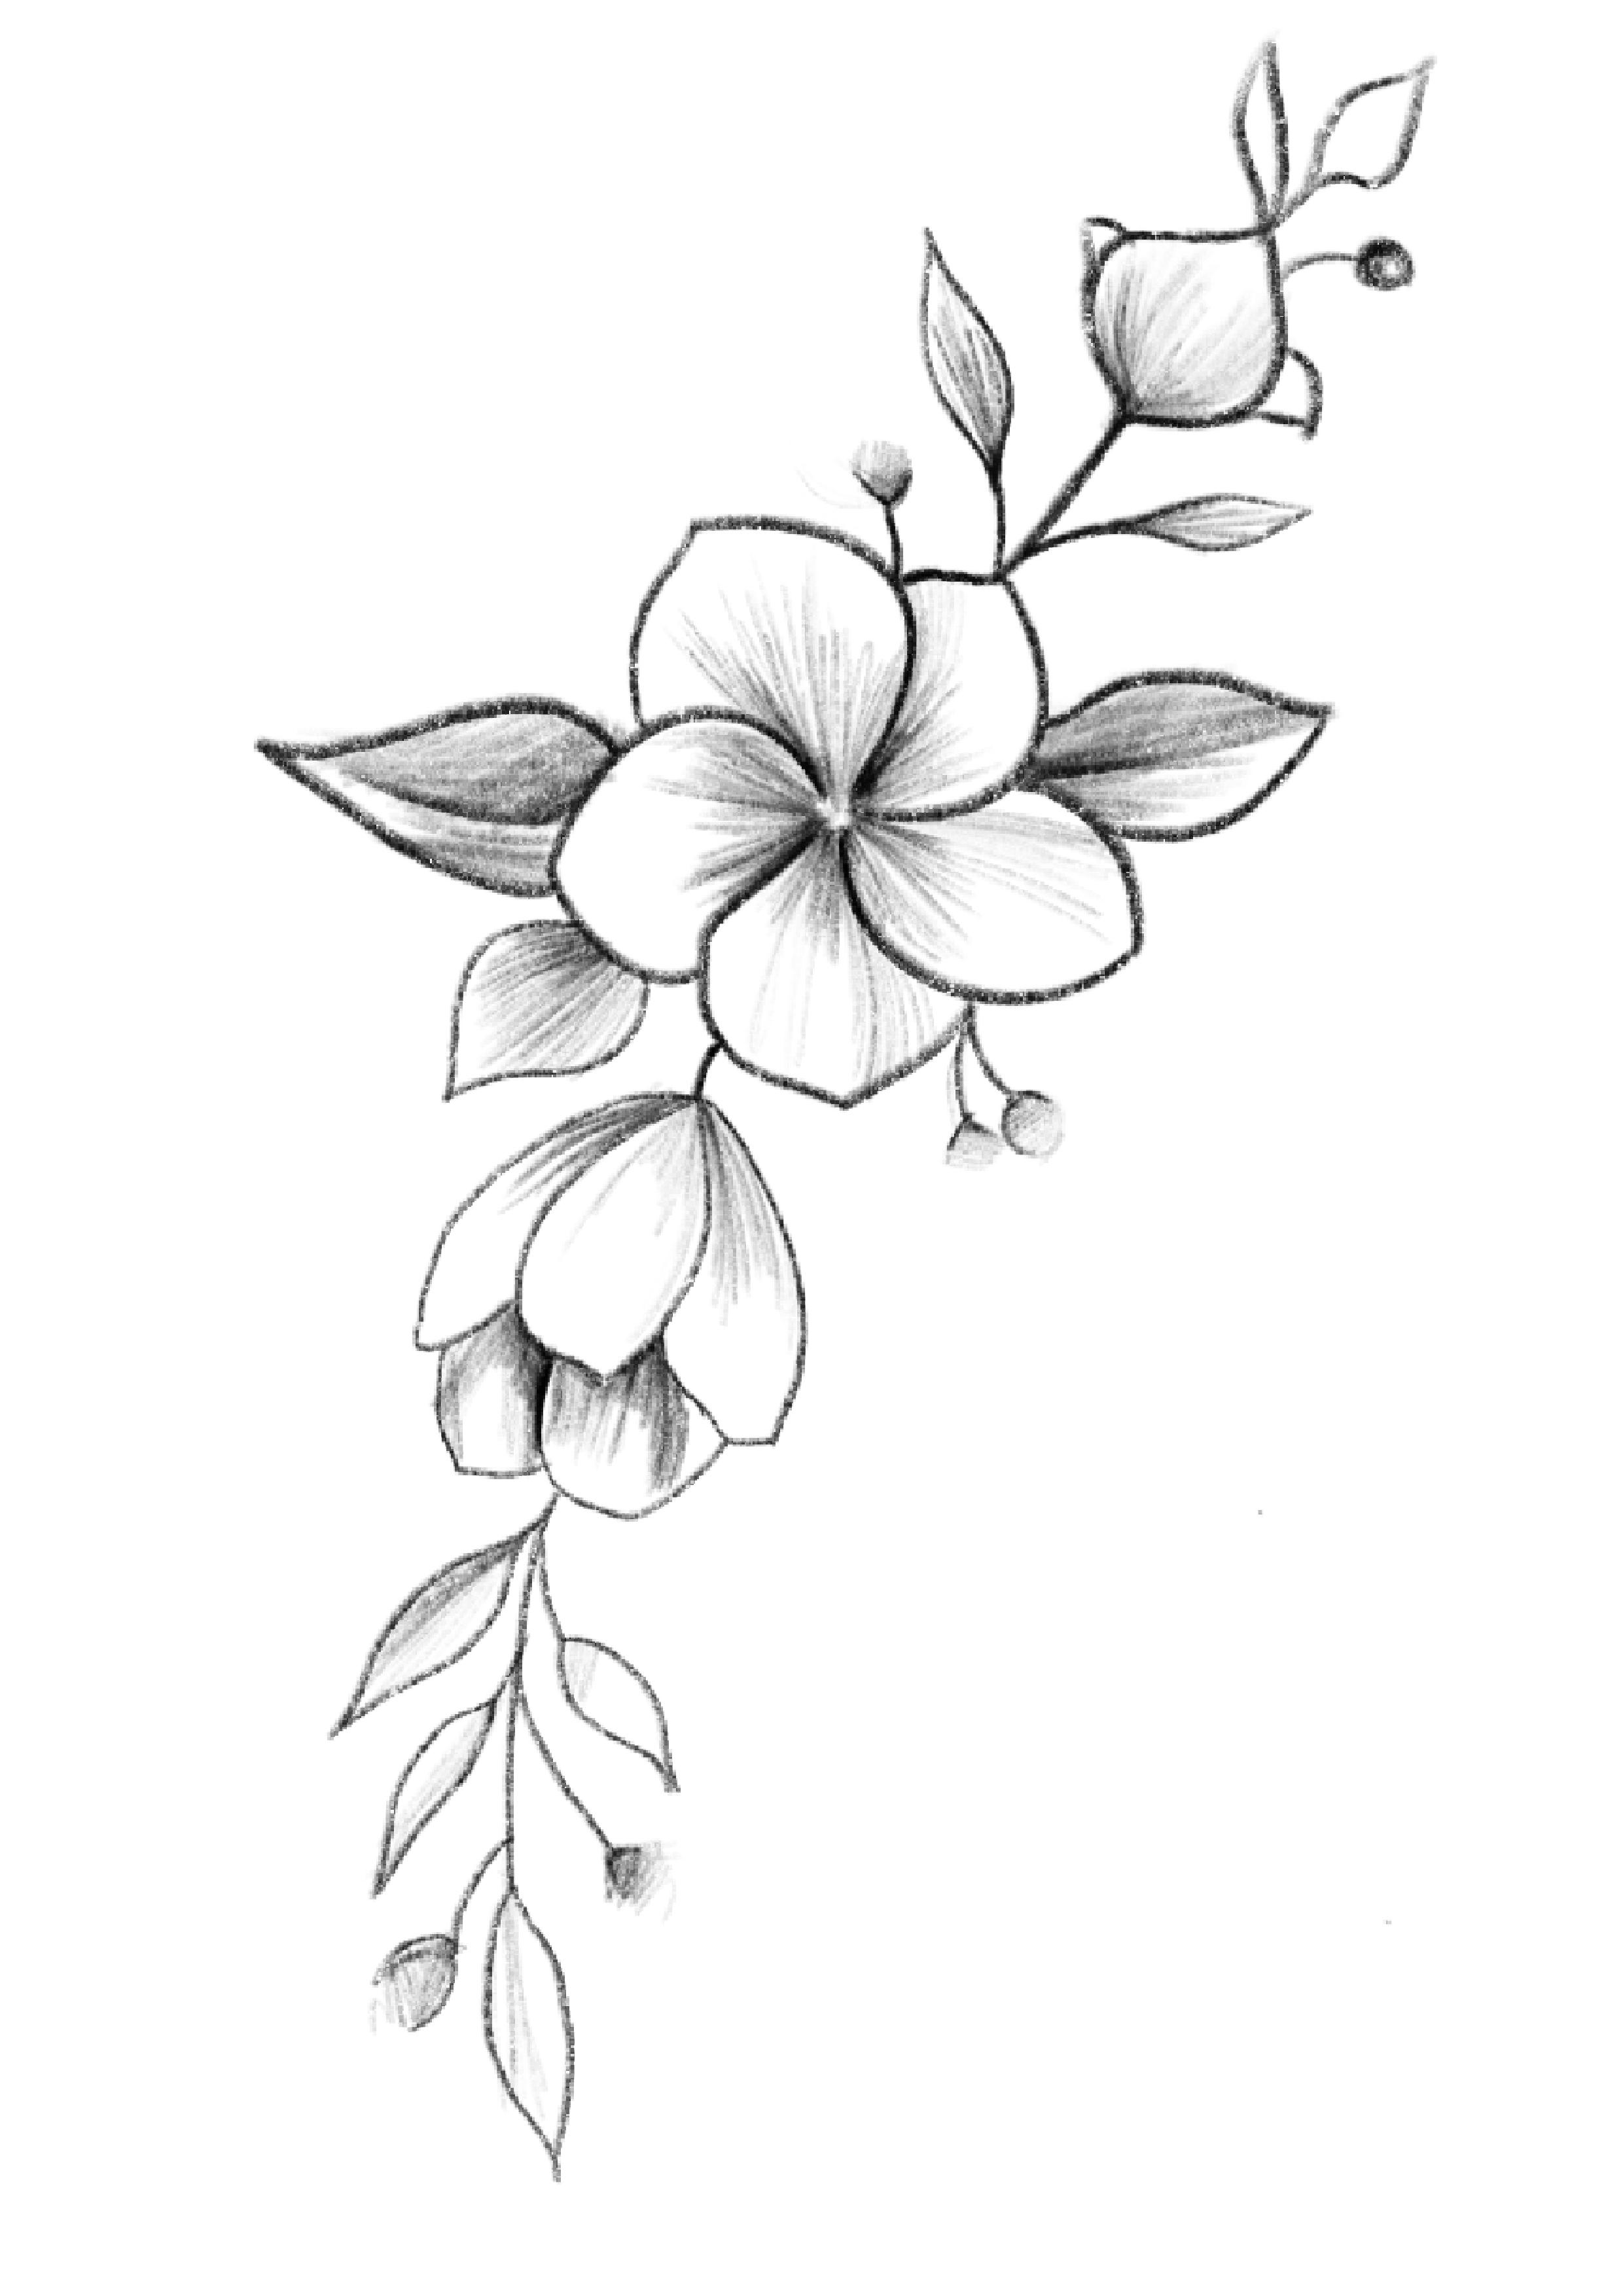 Pin By Jesseiejean On Tattoodesign Pencil Drawings Of Flowers Flower Art Drawing Flower Drawing